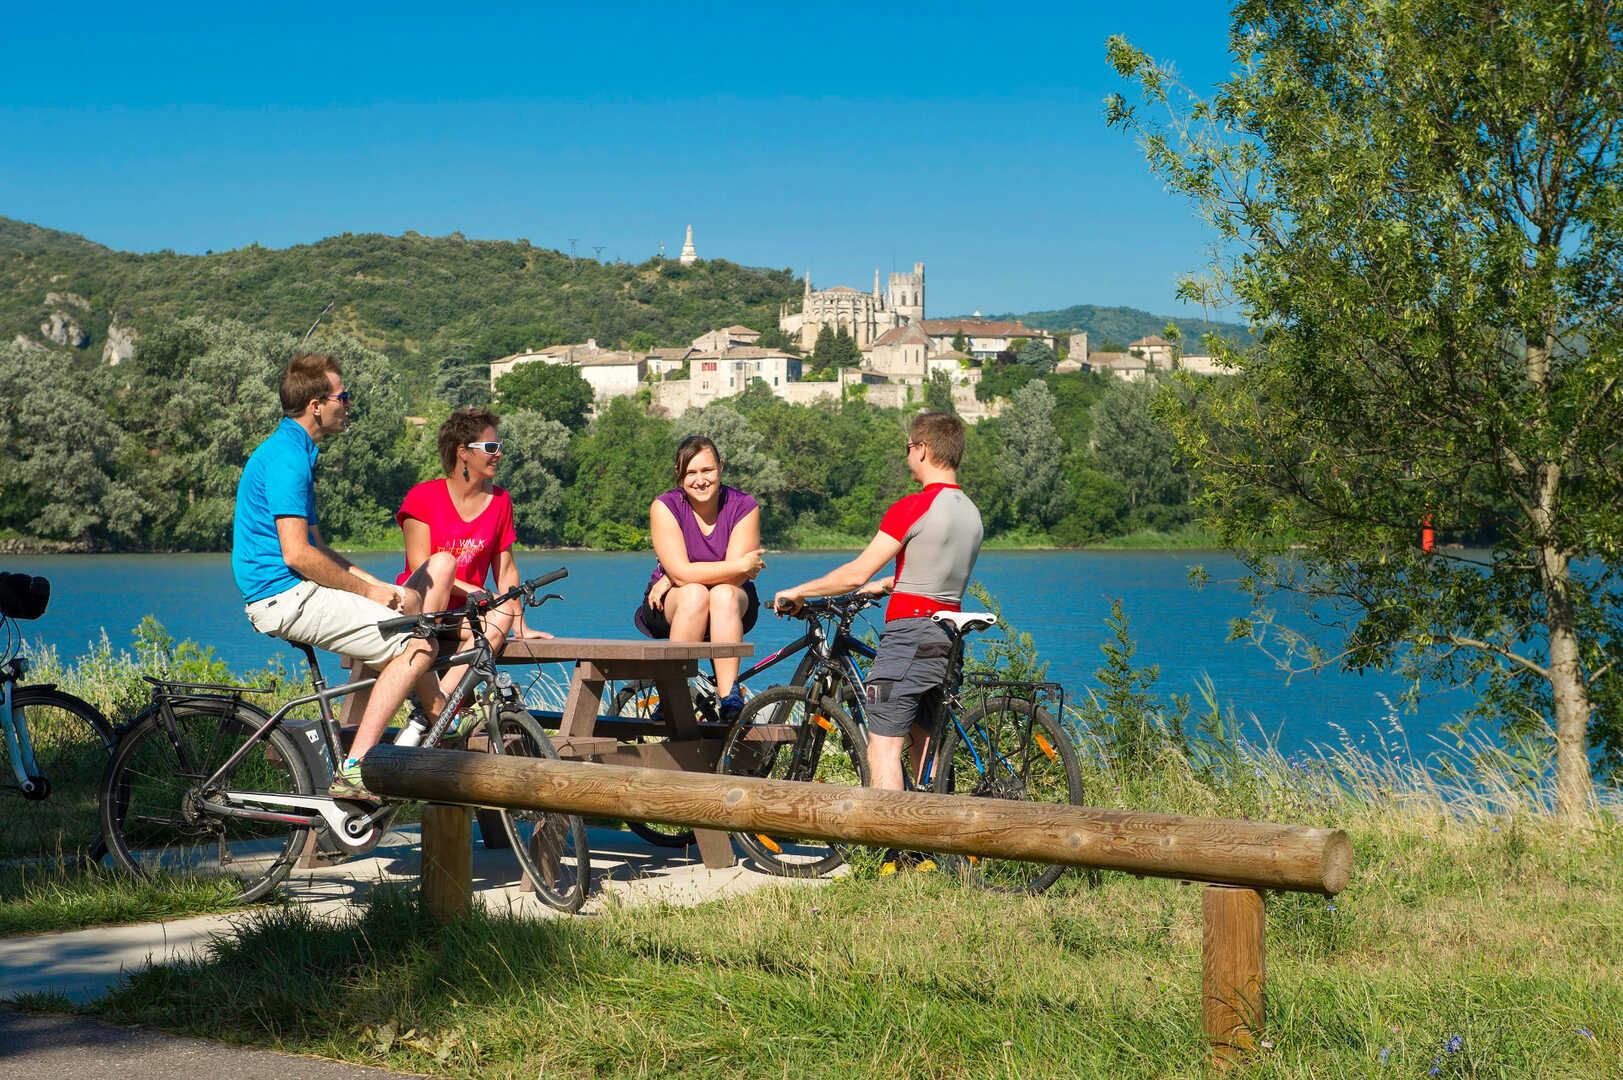 Piste cyclable le long du Rhône en Ardèche : Valence / La